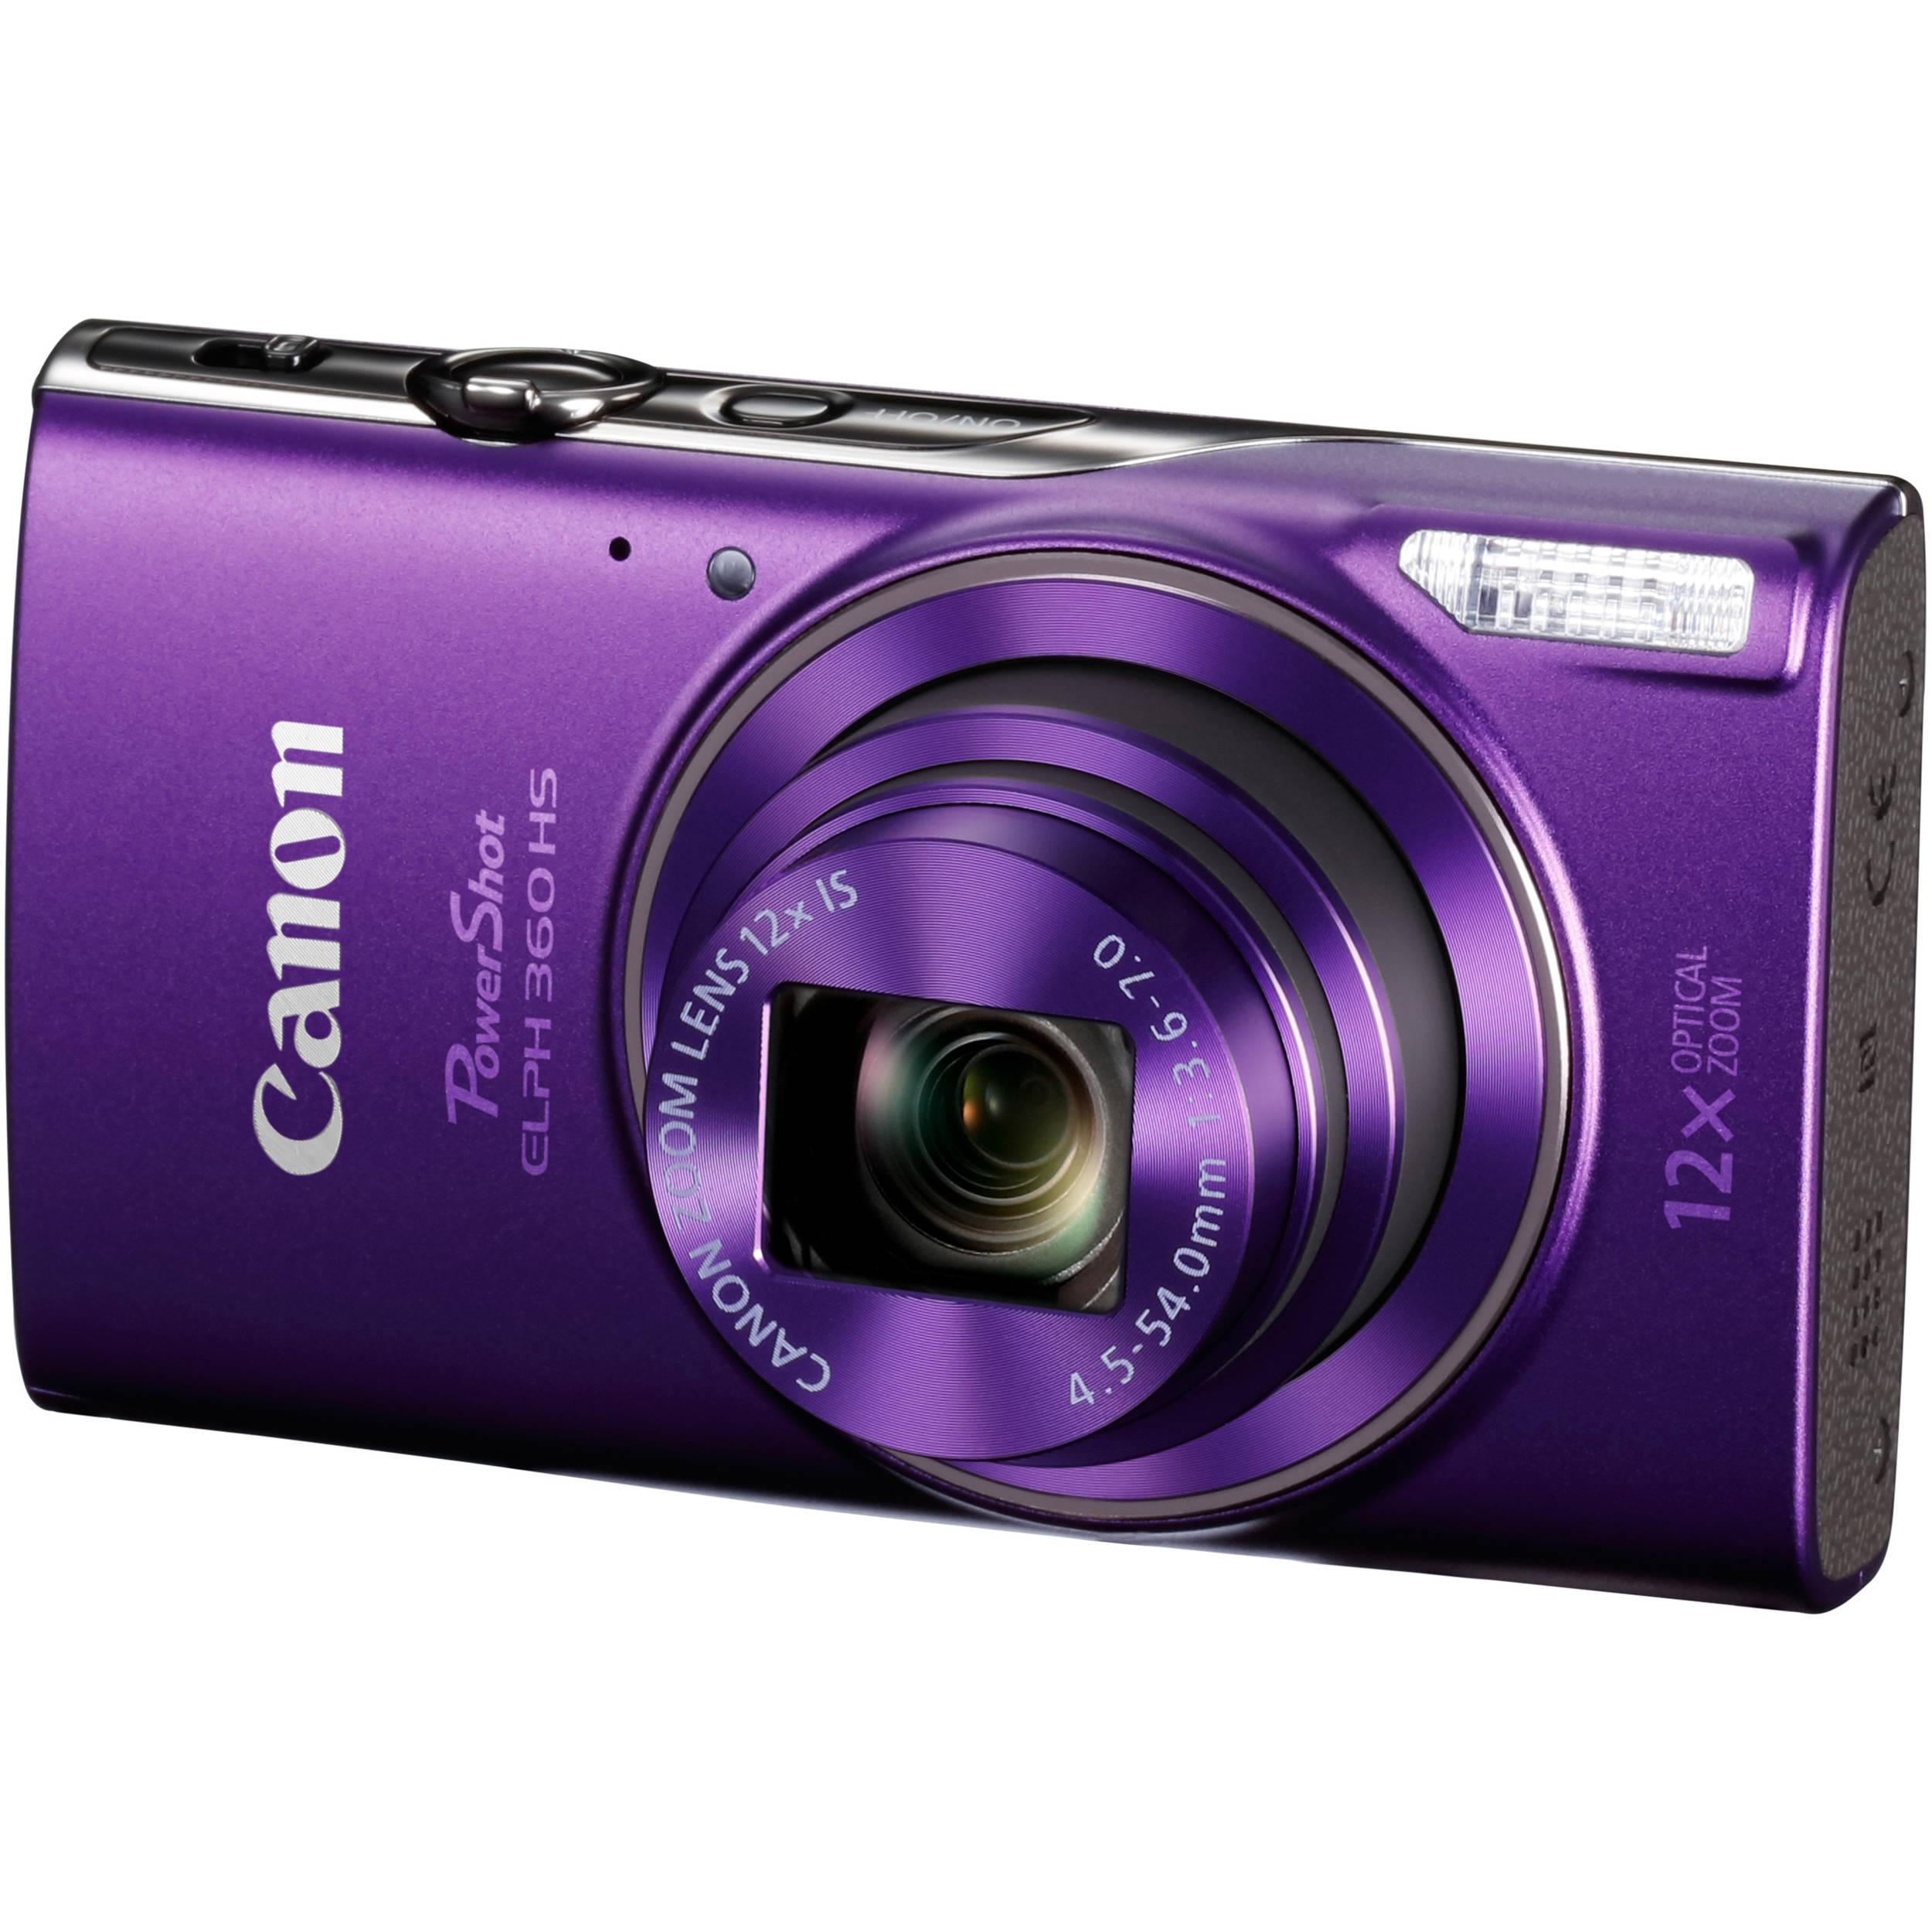 Canon Shot Elph 360 Hs Digital Camera Purple